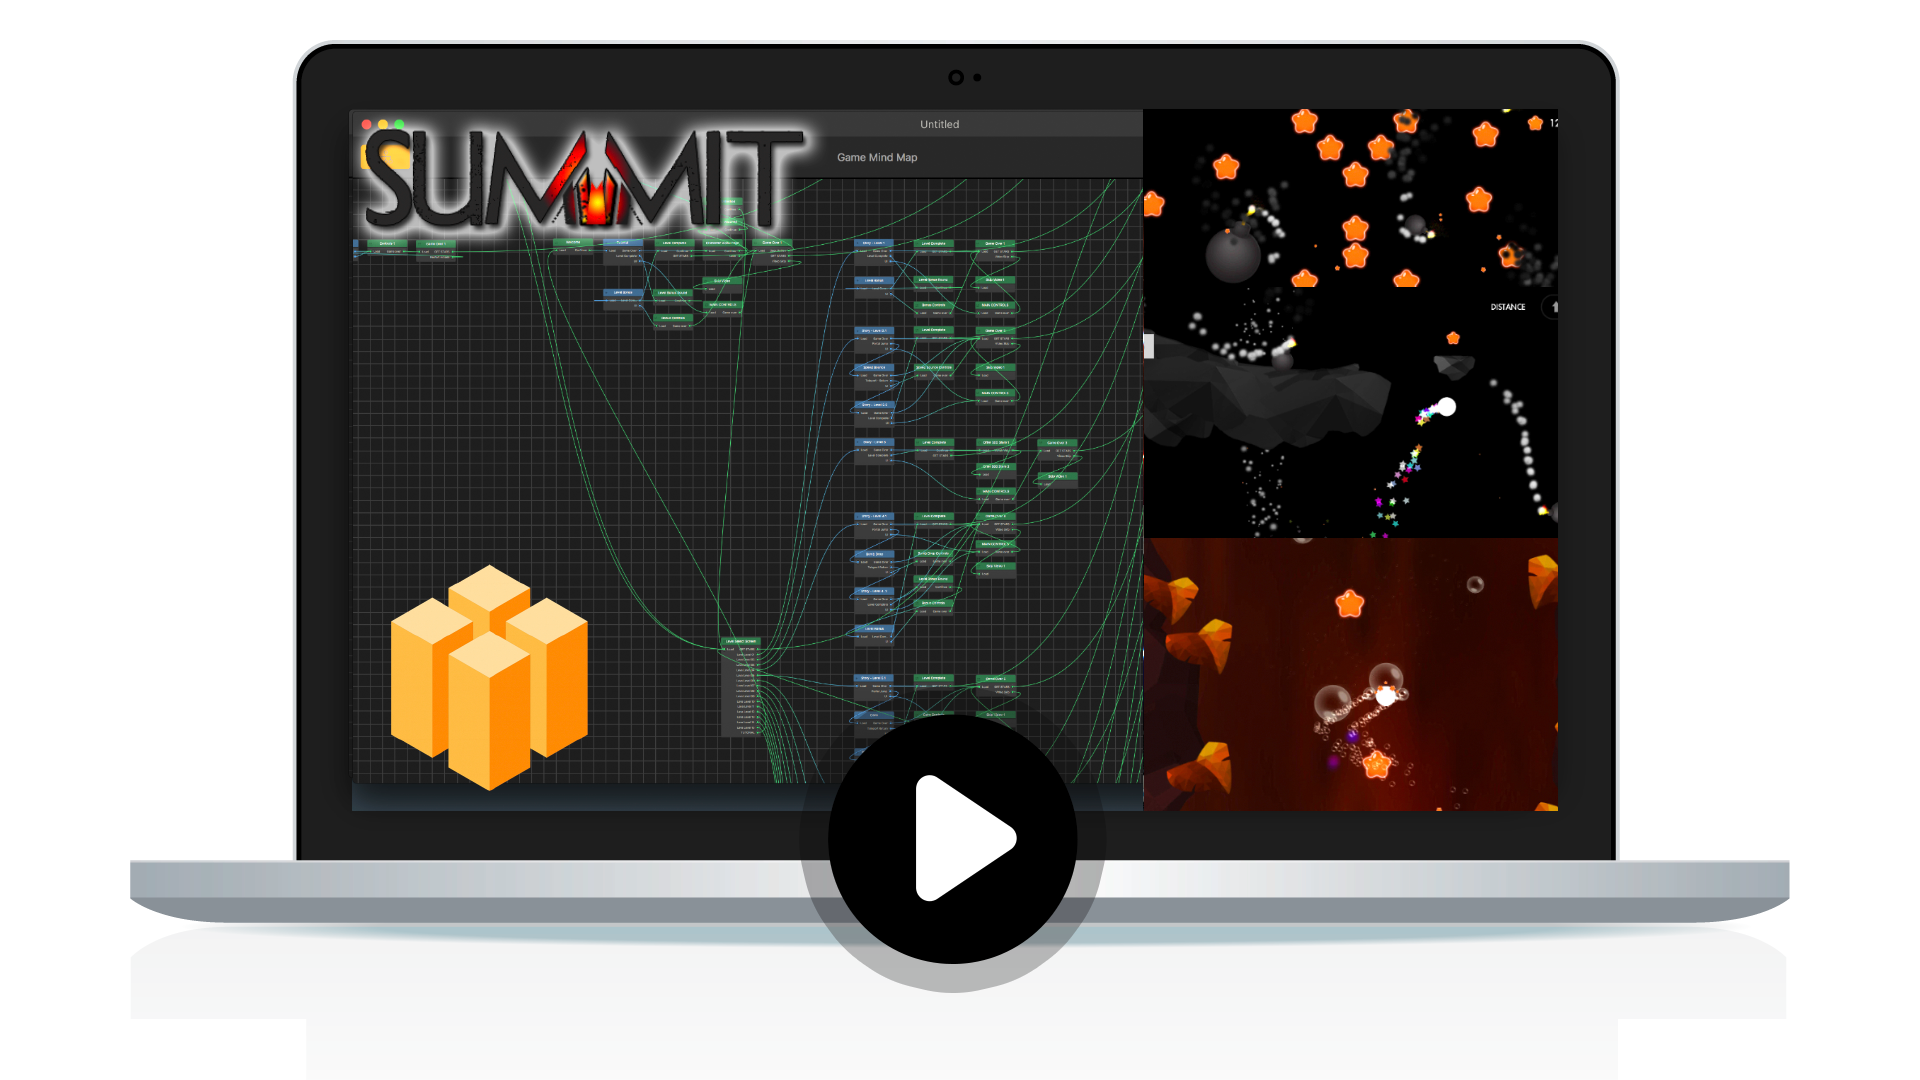 Summit Demo - Buildbox Training Project